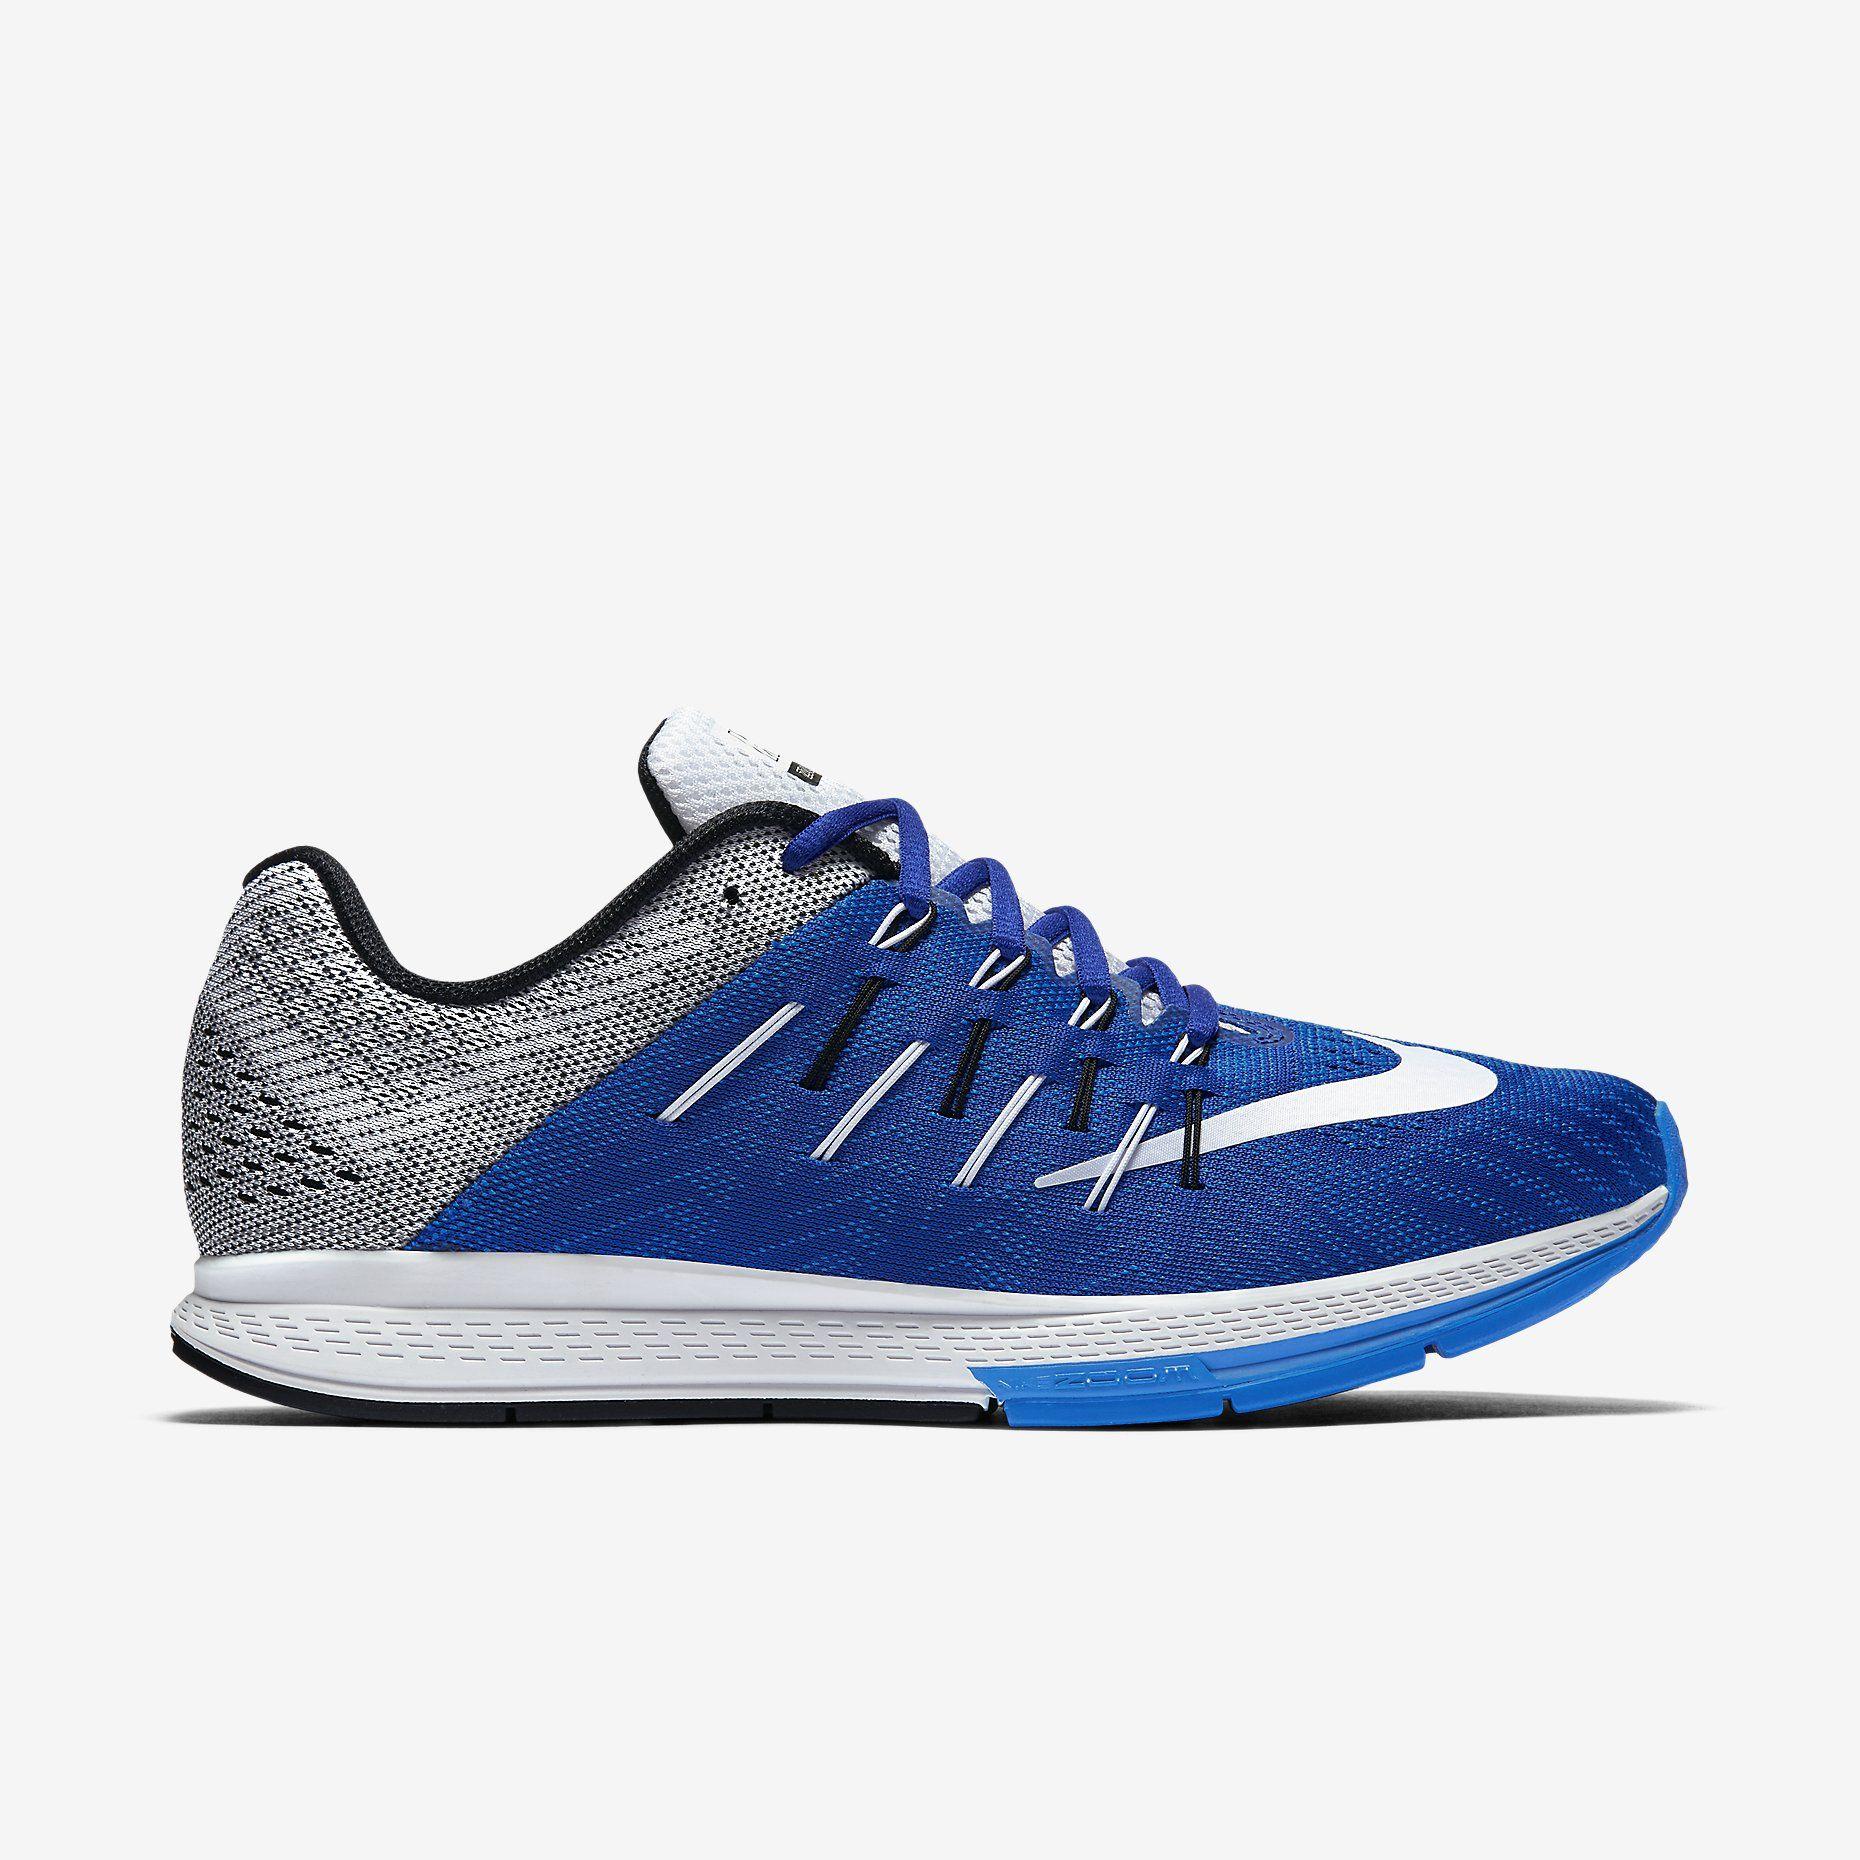 Nike Air Zoom Elite 8 Mens Running Shoes Concord/Black/Photo Blue/White 748588-402